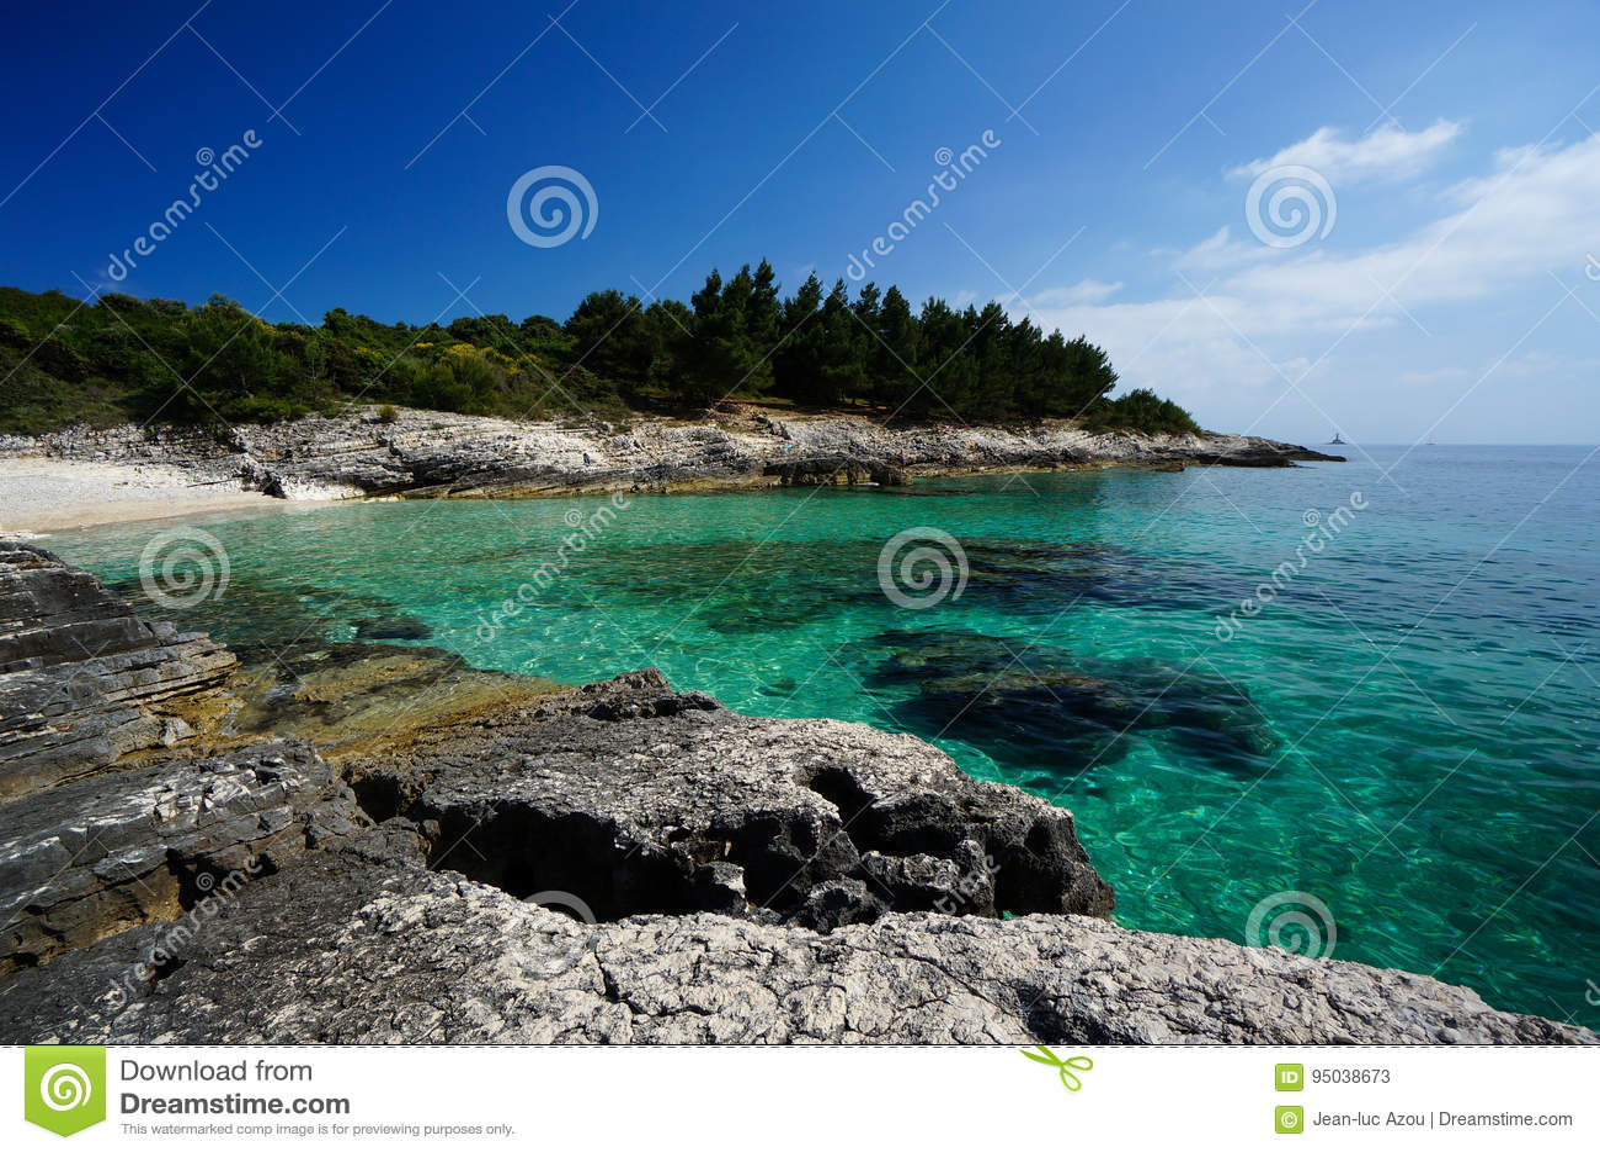 Premantura Pensinsula coast, Croatia